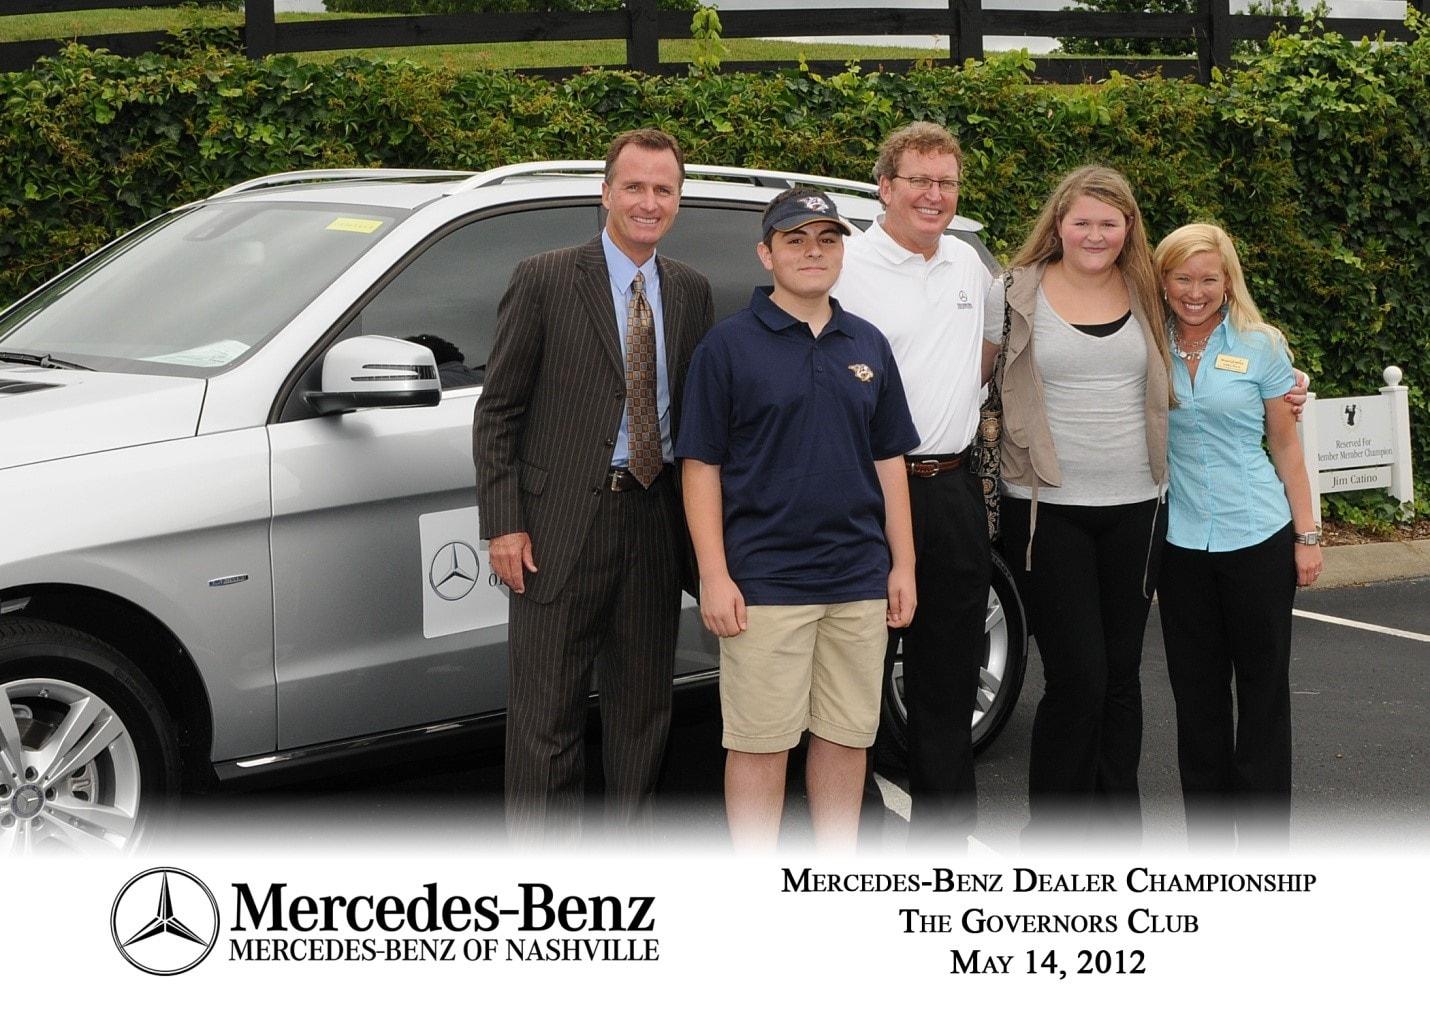 Mercedes-Benz of Nashville | New Mercedes-Benz dealership in ... on hummer club, nissan club, mercedes star, mercedes interior, mercedes diesel club, mercedes car club of america, mini cooper club, jaguar club, audi club, honda club, jeep club, photography club, austin club,